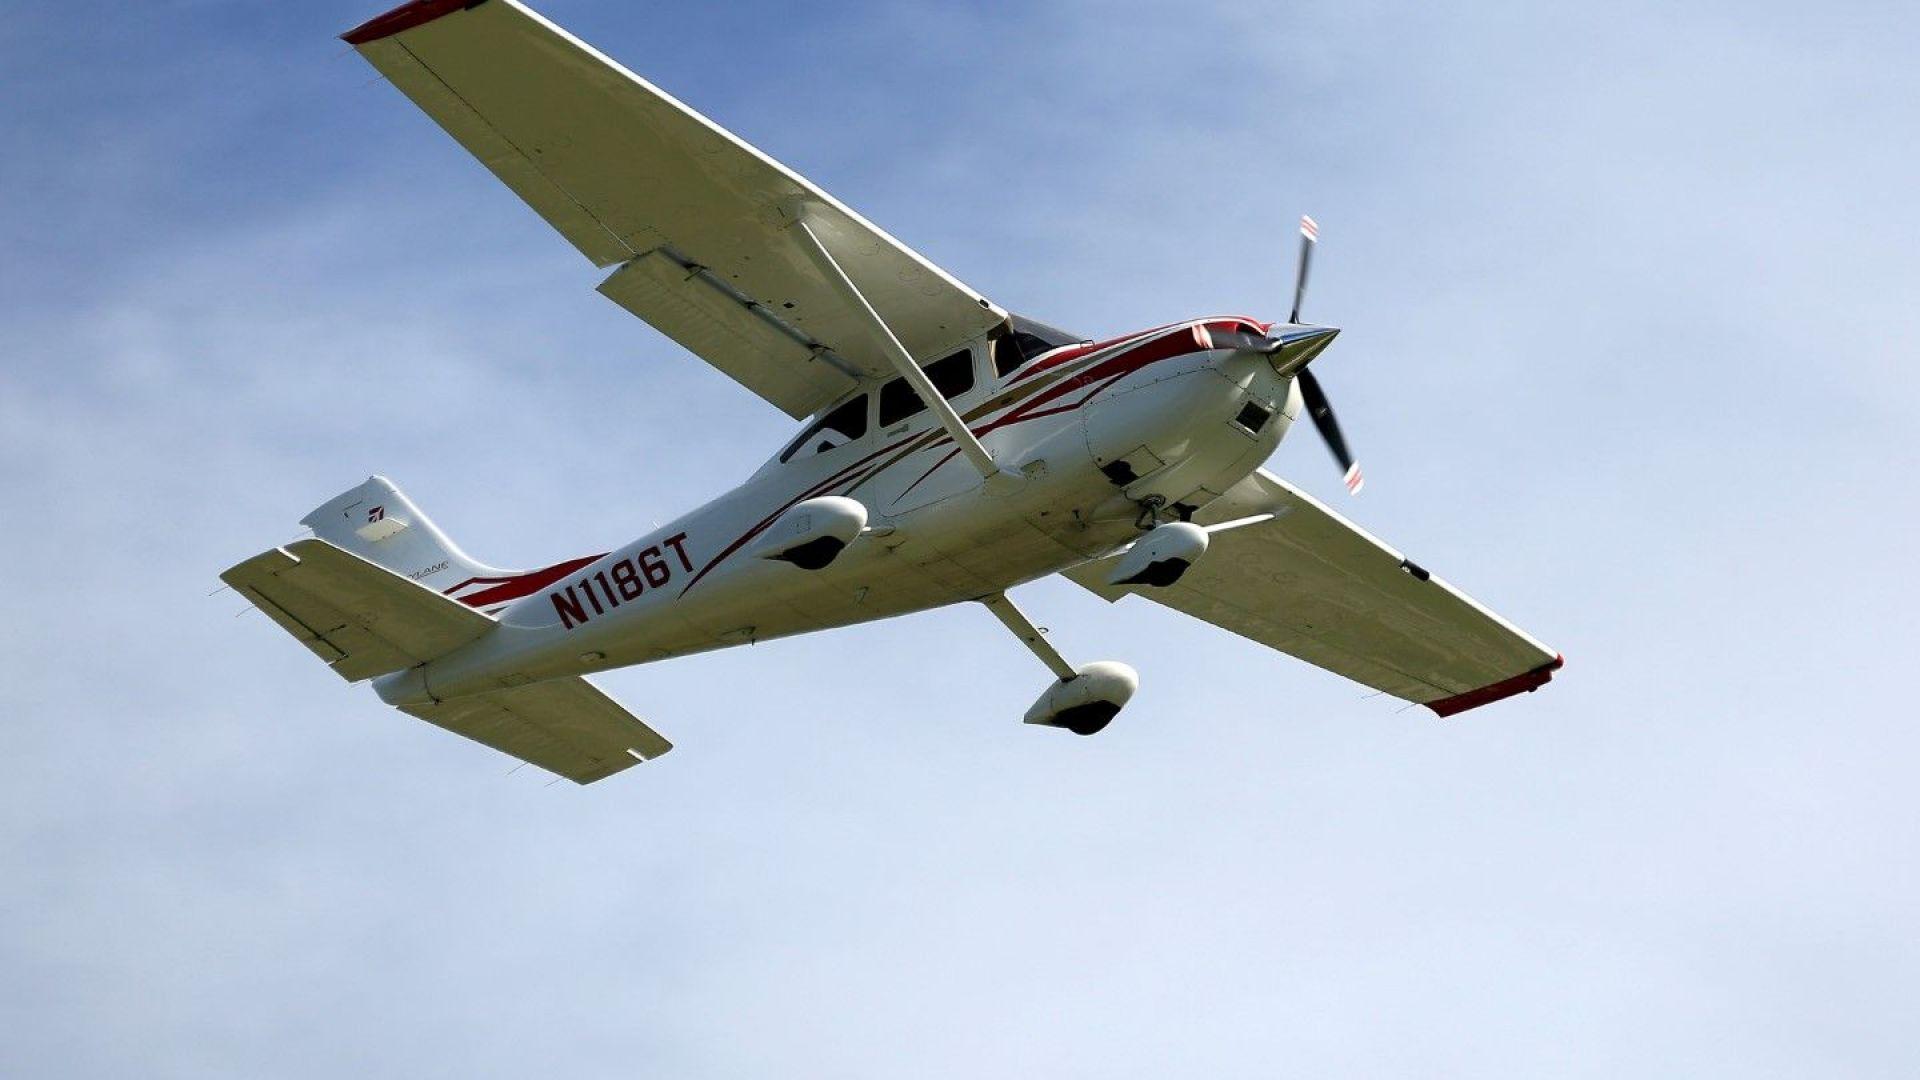 Курсист безопасно приземи самолет по време на урок по летене